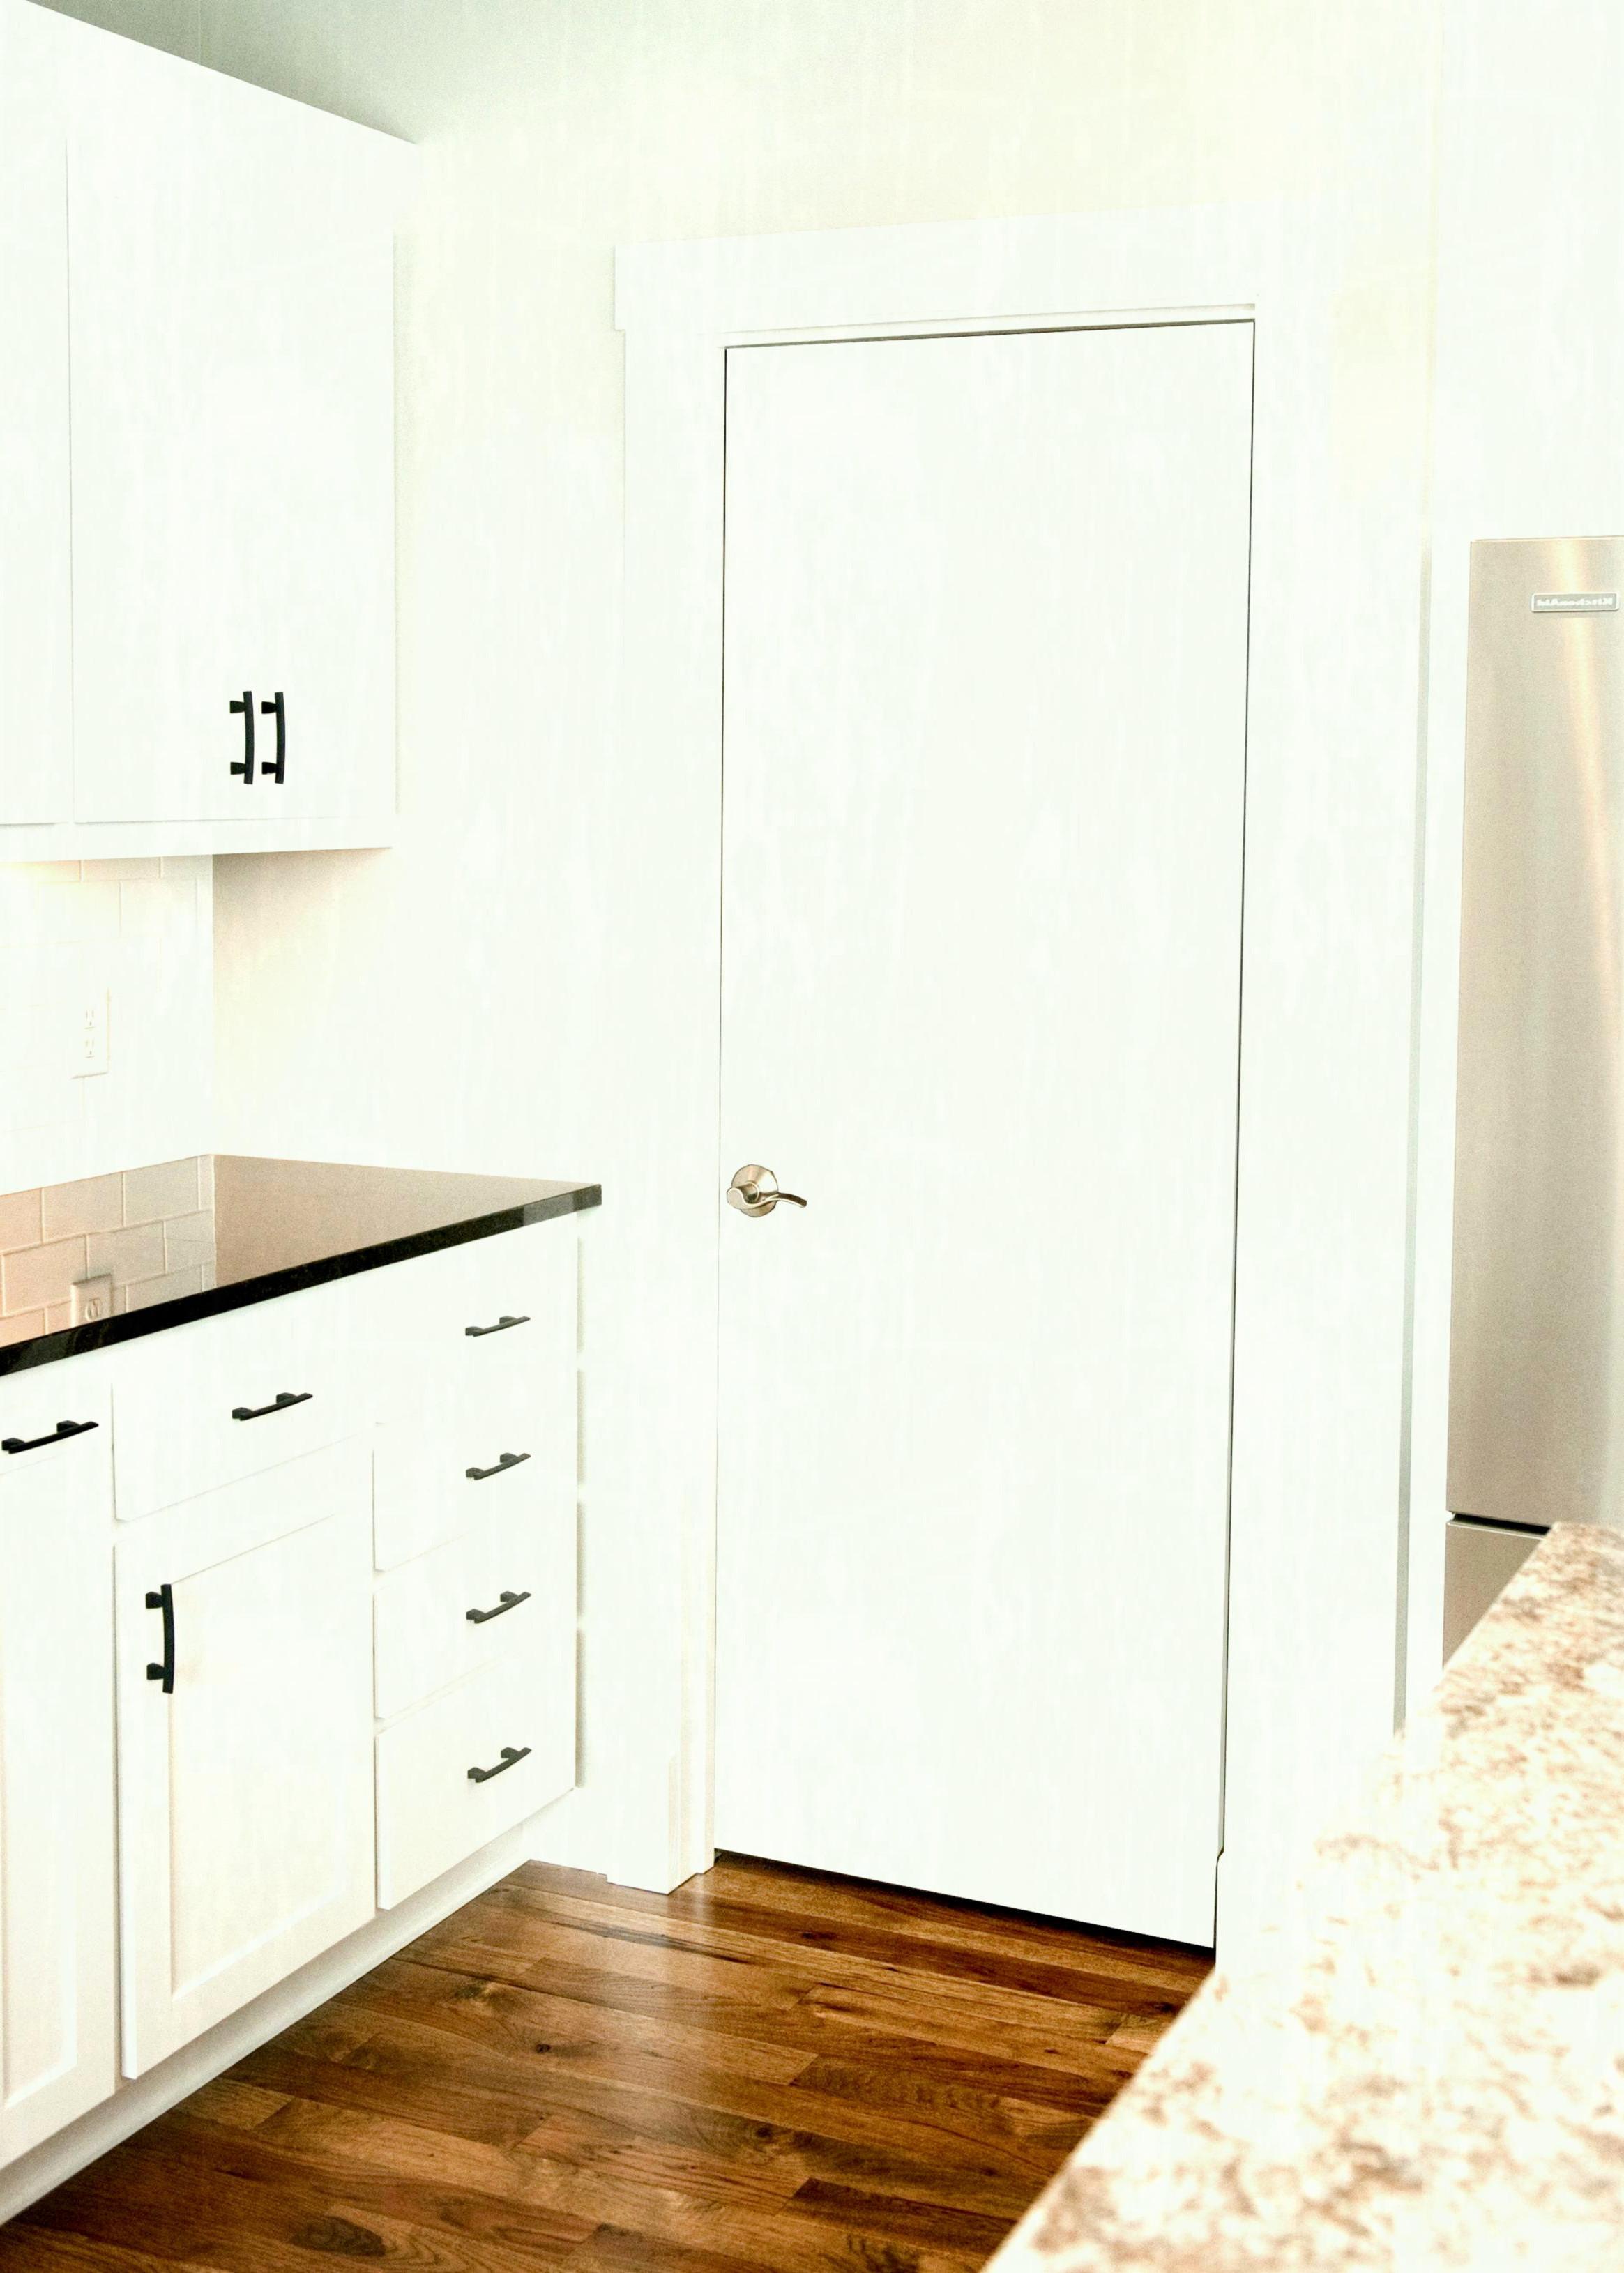 kitchens with hardwood floors and white cabinets of white kitchen cabinet doors luxury white modern kitchen cabinets intended for white kitchen cabinet doors luxury white modern kitchen cabinets elegant kuchya a family line od black